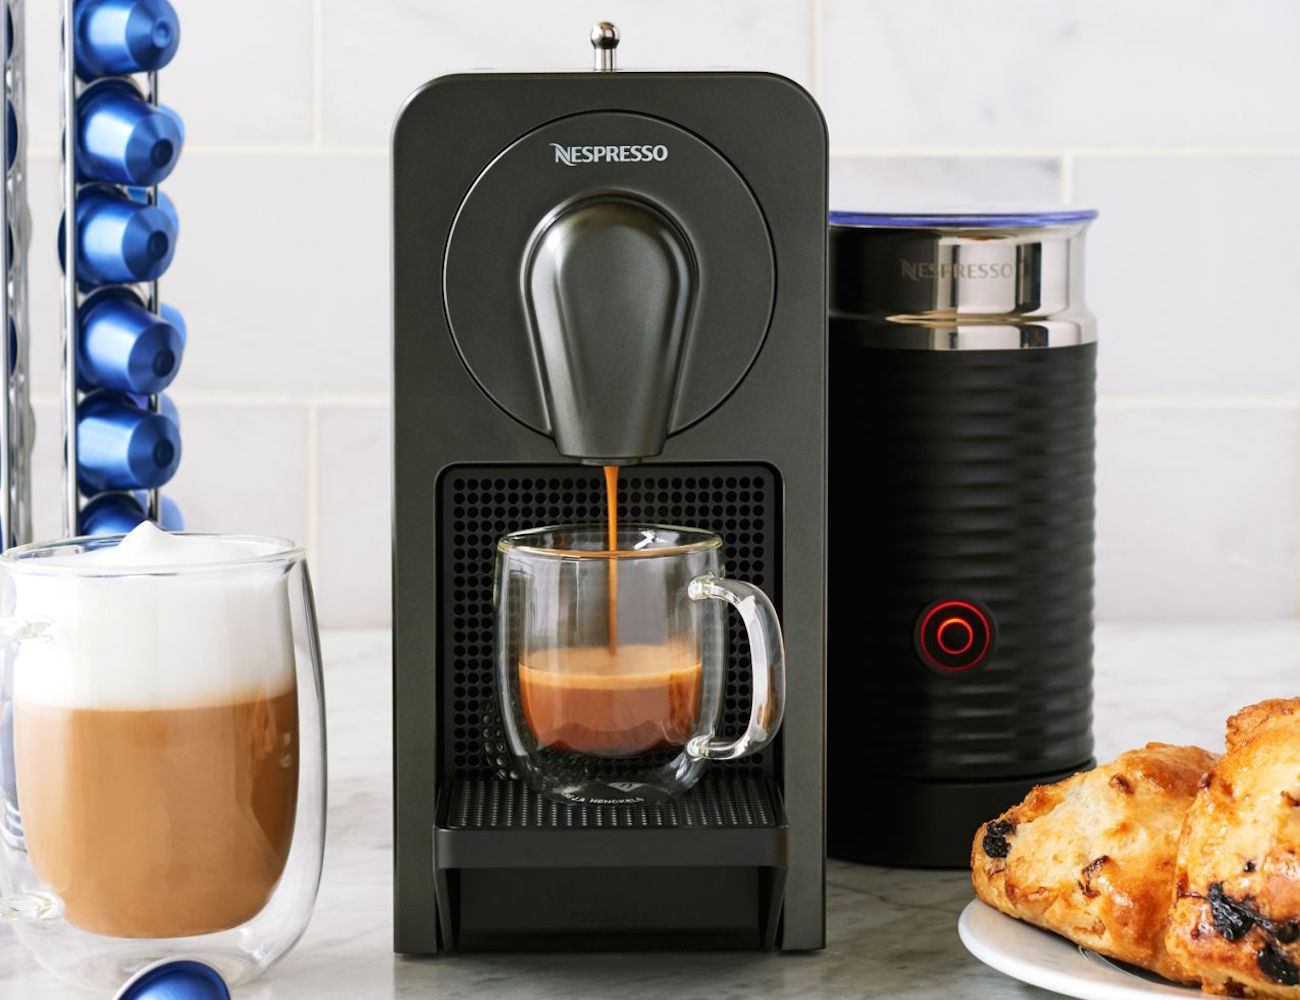 Nespresso+Prodigo+Smart+Espresso+Machine